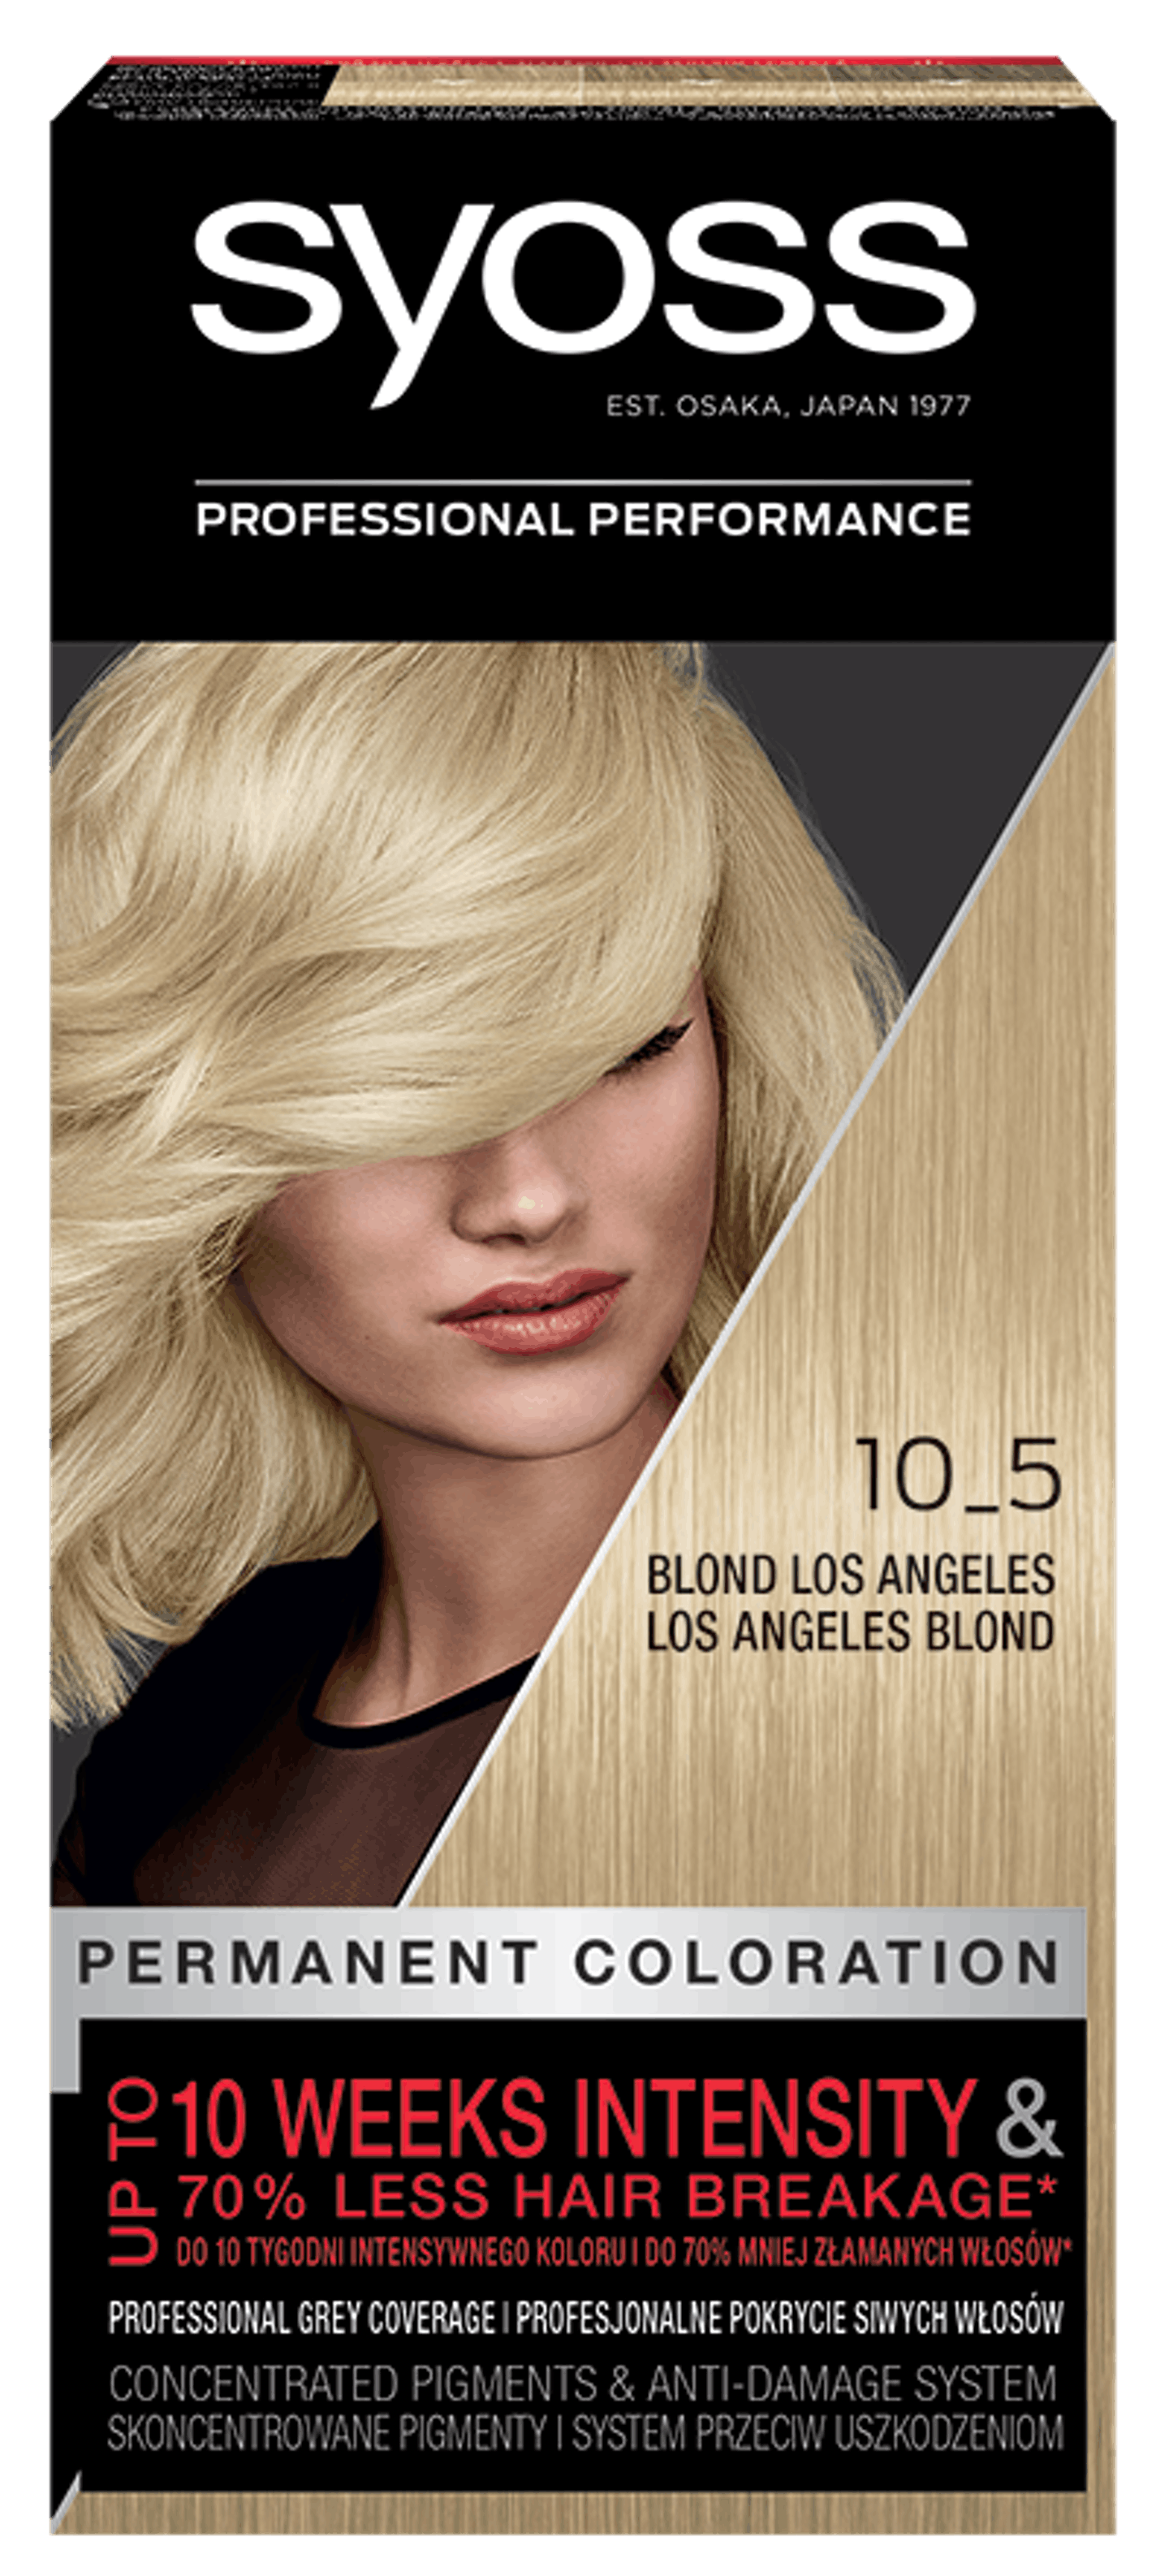 Syoss Trwała Koloryzacja Blond Los Angeles 10_5 pack shot